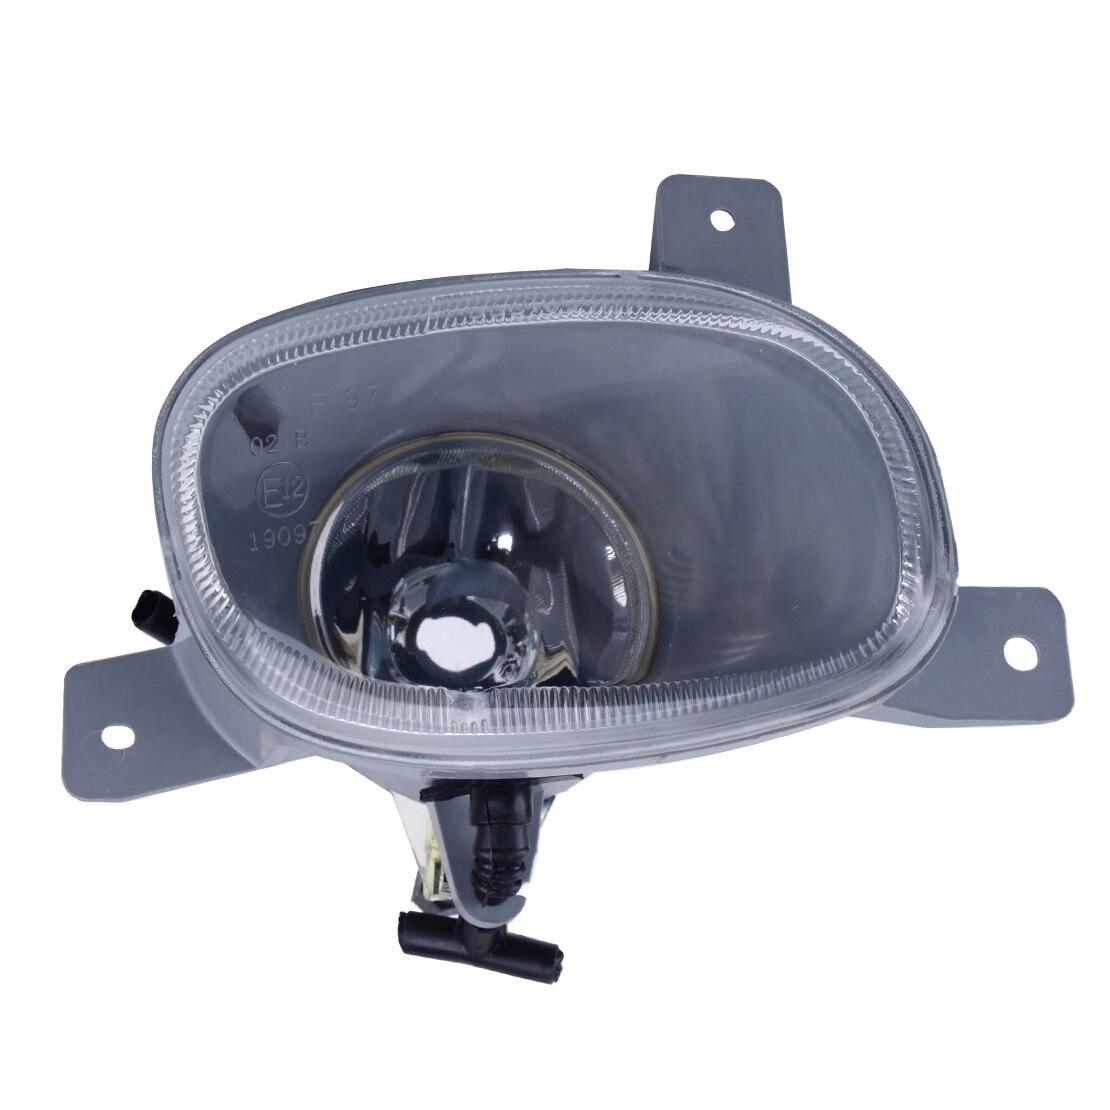 CITALL 1Pc Left Right Front Bumper Fog Light Lamp 8620224 8620225 Fit For Volvo S80 1999 2000 2001 2002 2003 2004 2005 2006